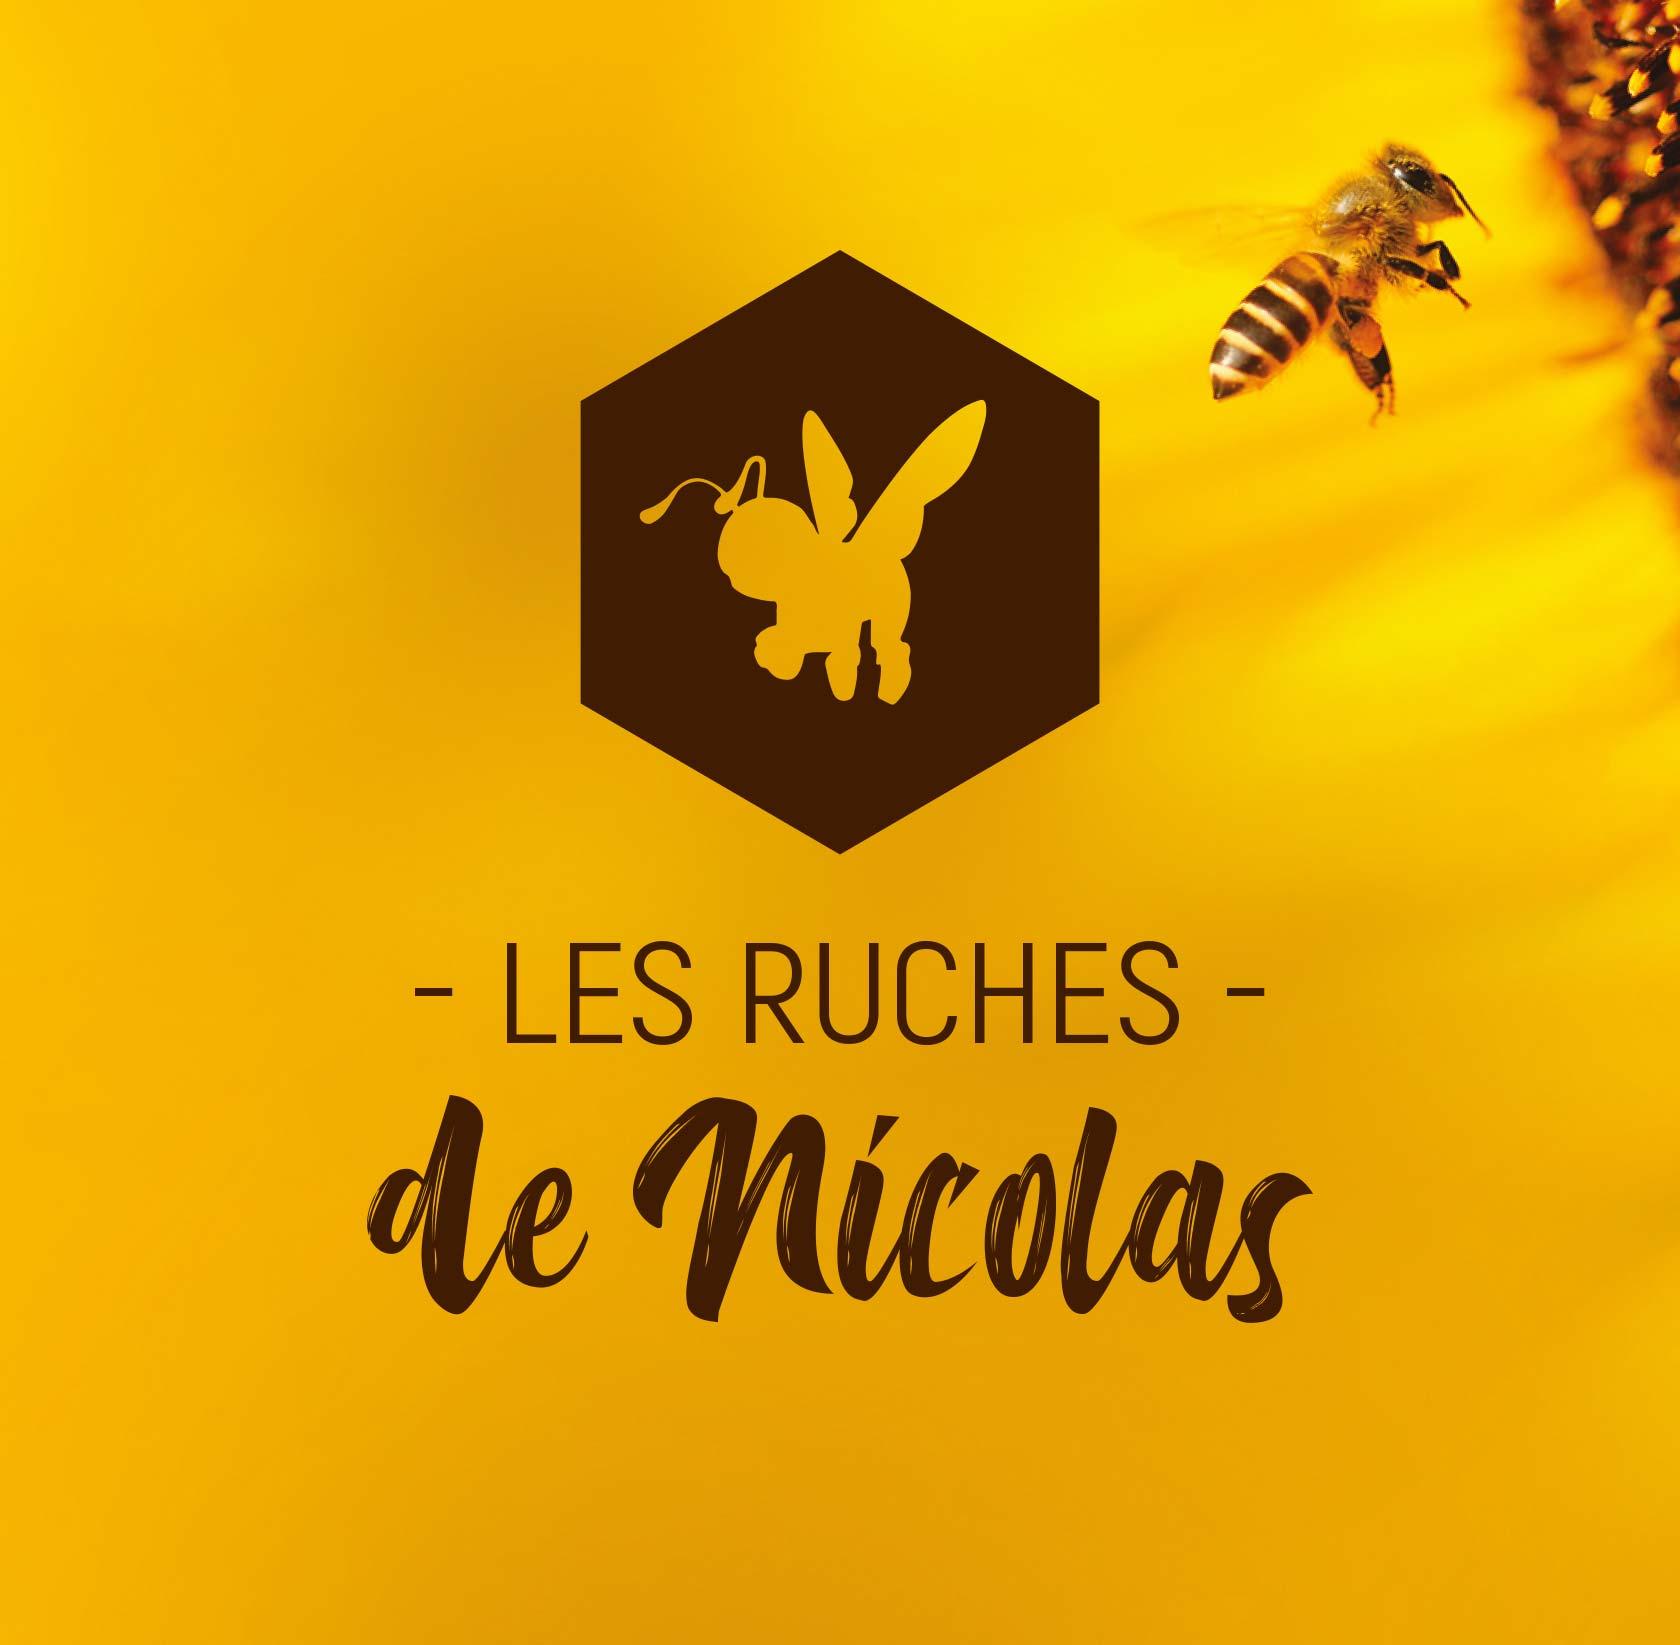 LesRuchesdeNicolas